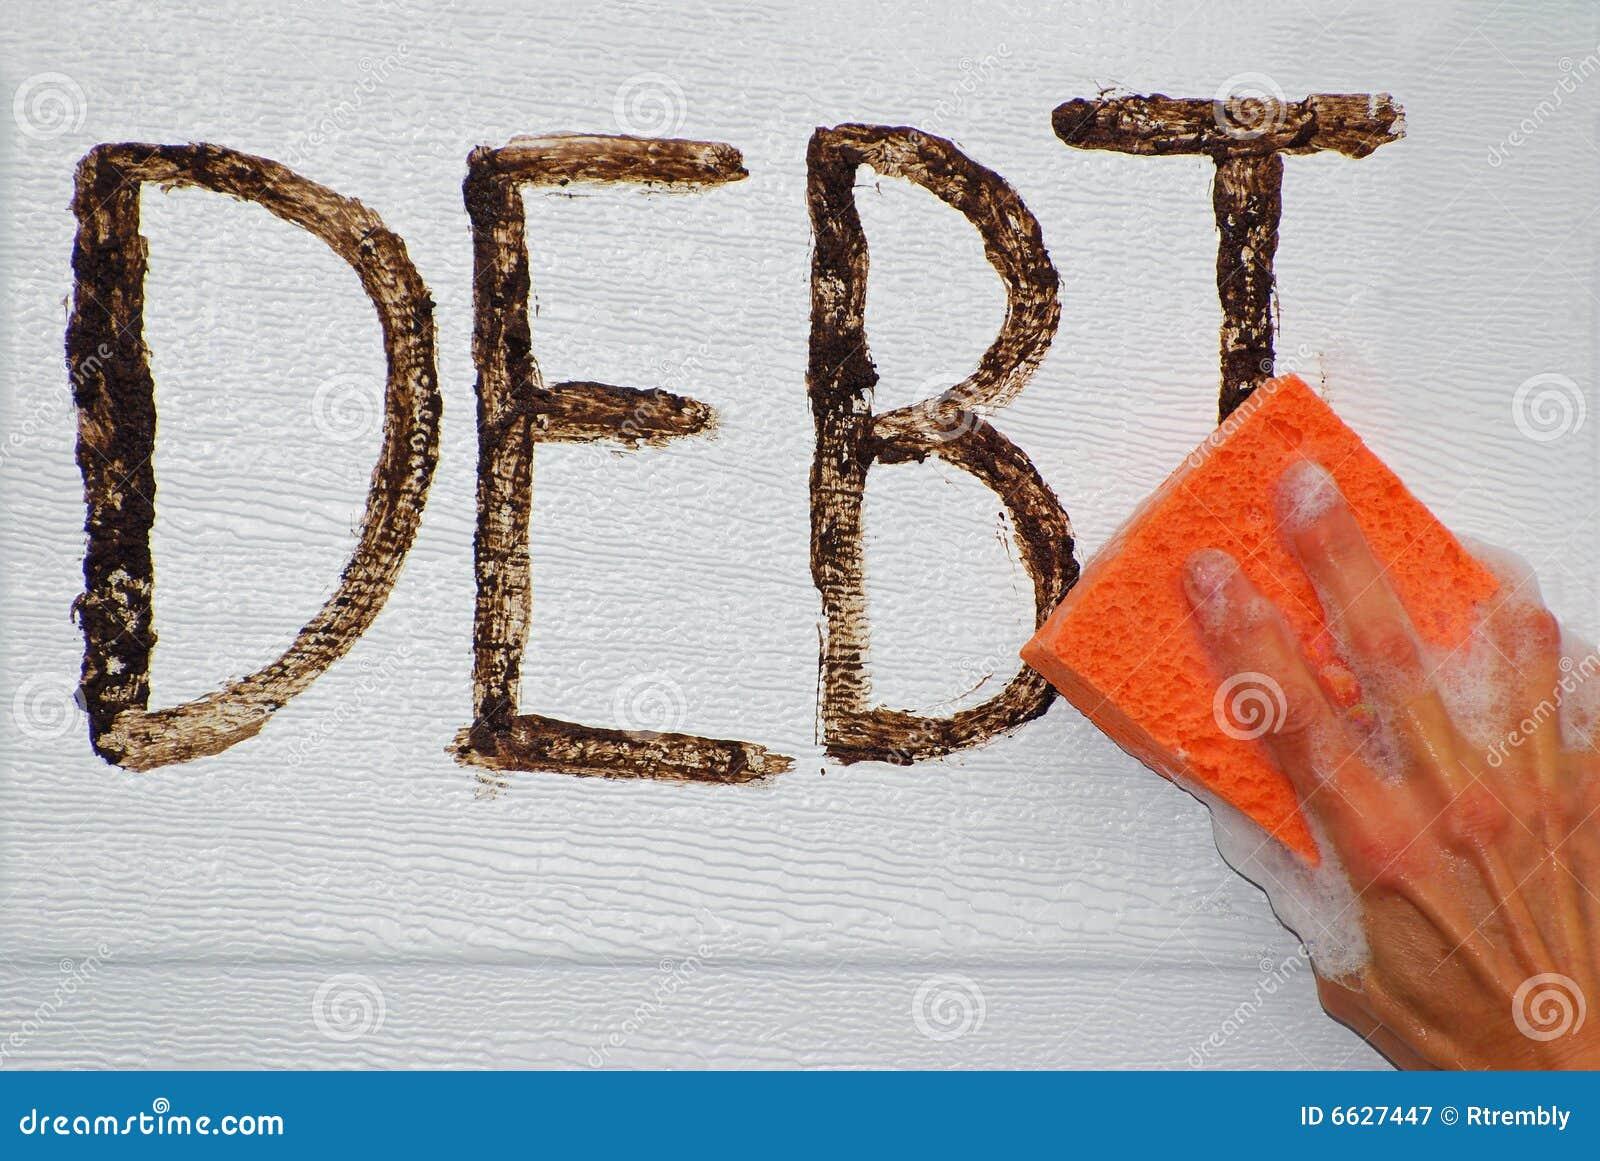 Limpando para fora o débito